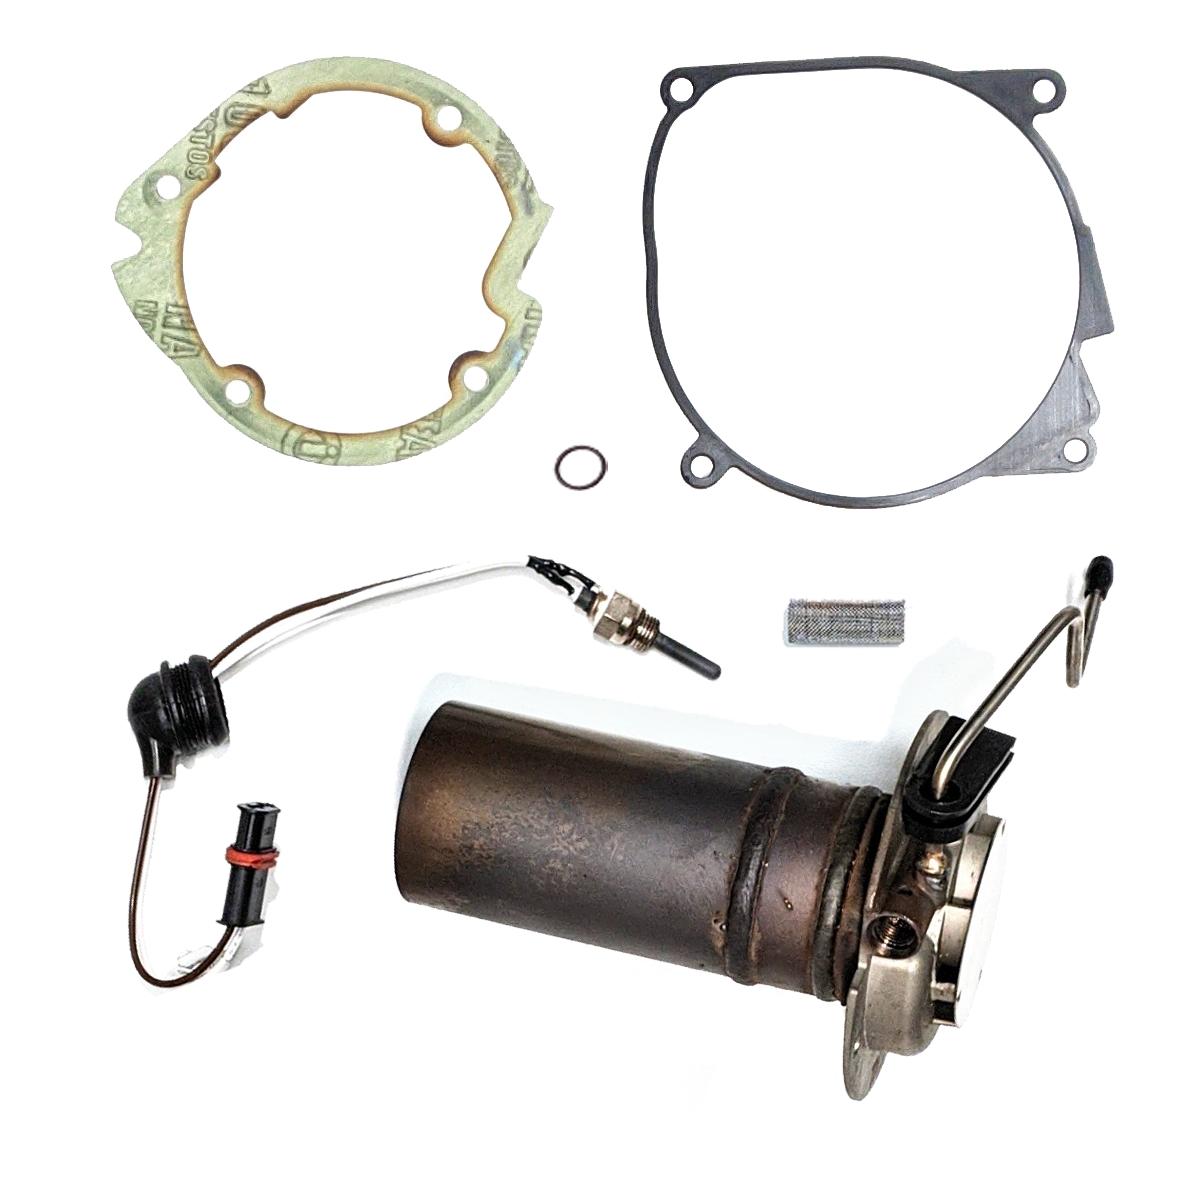 Bison 4a maintenance kit